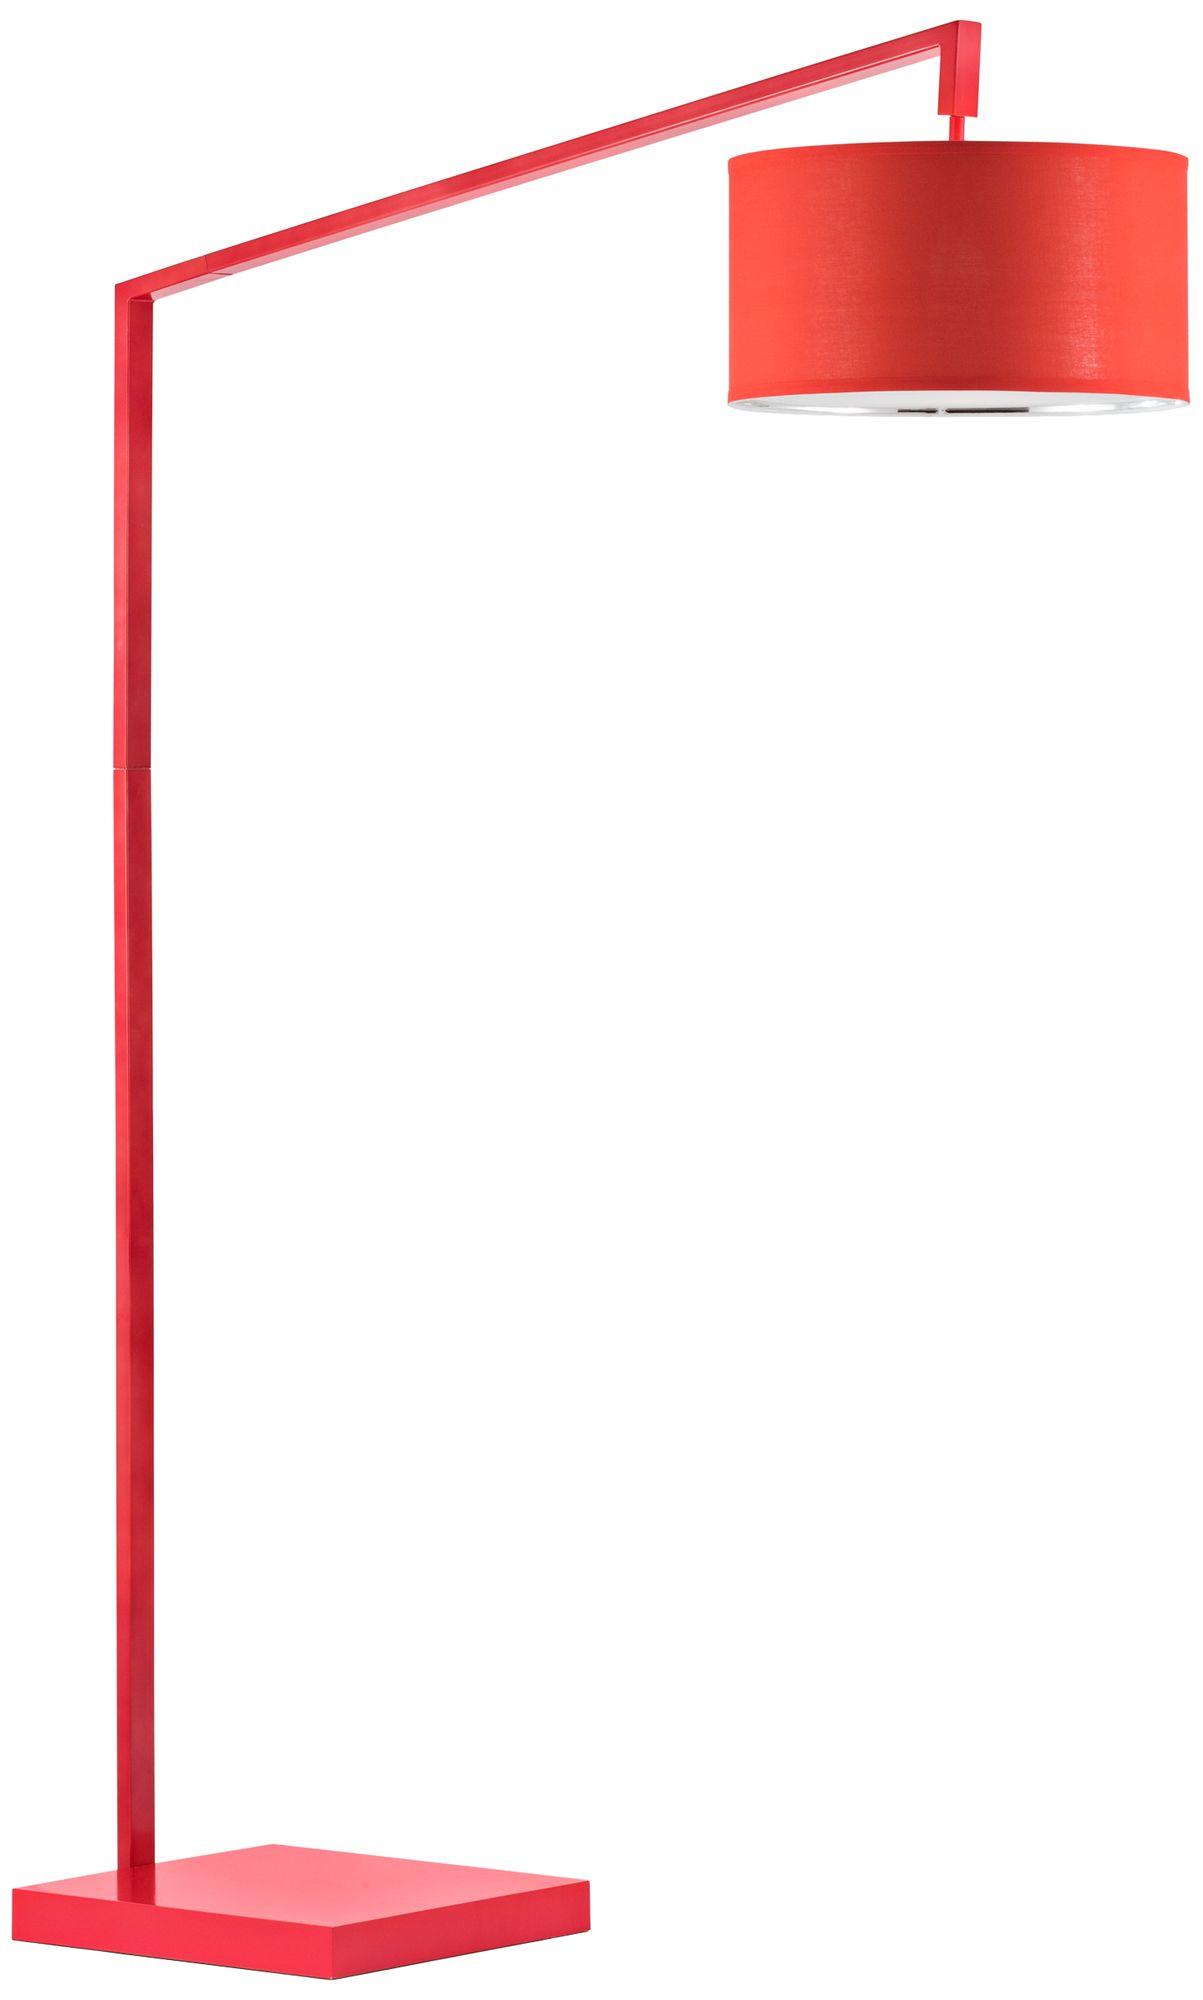 Nova Stretch Bright Red Chairside Steel Arc Floor Lamp